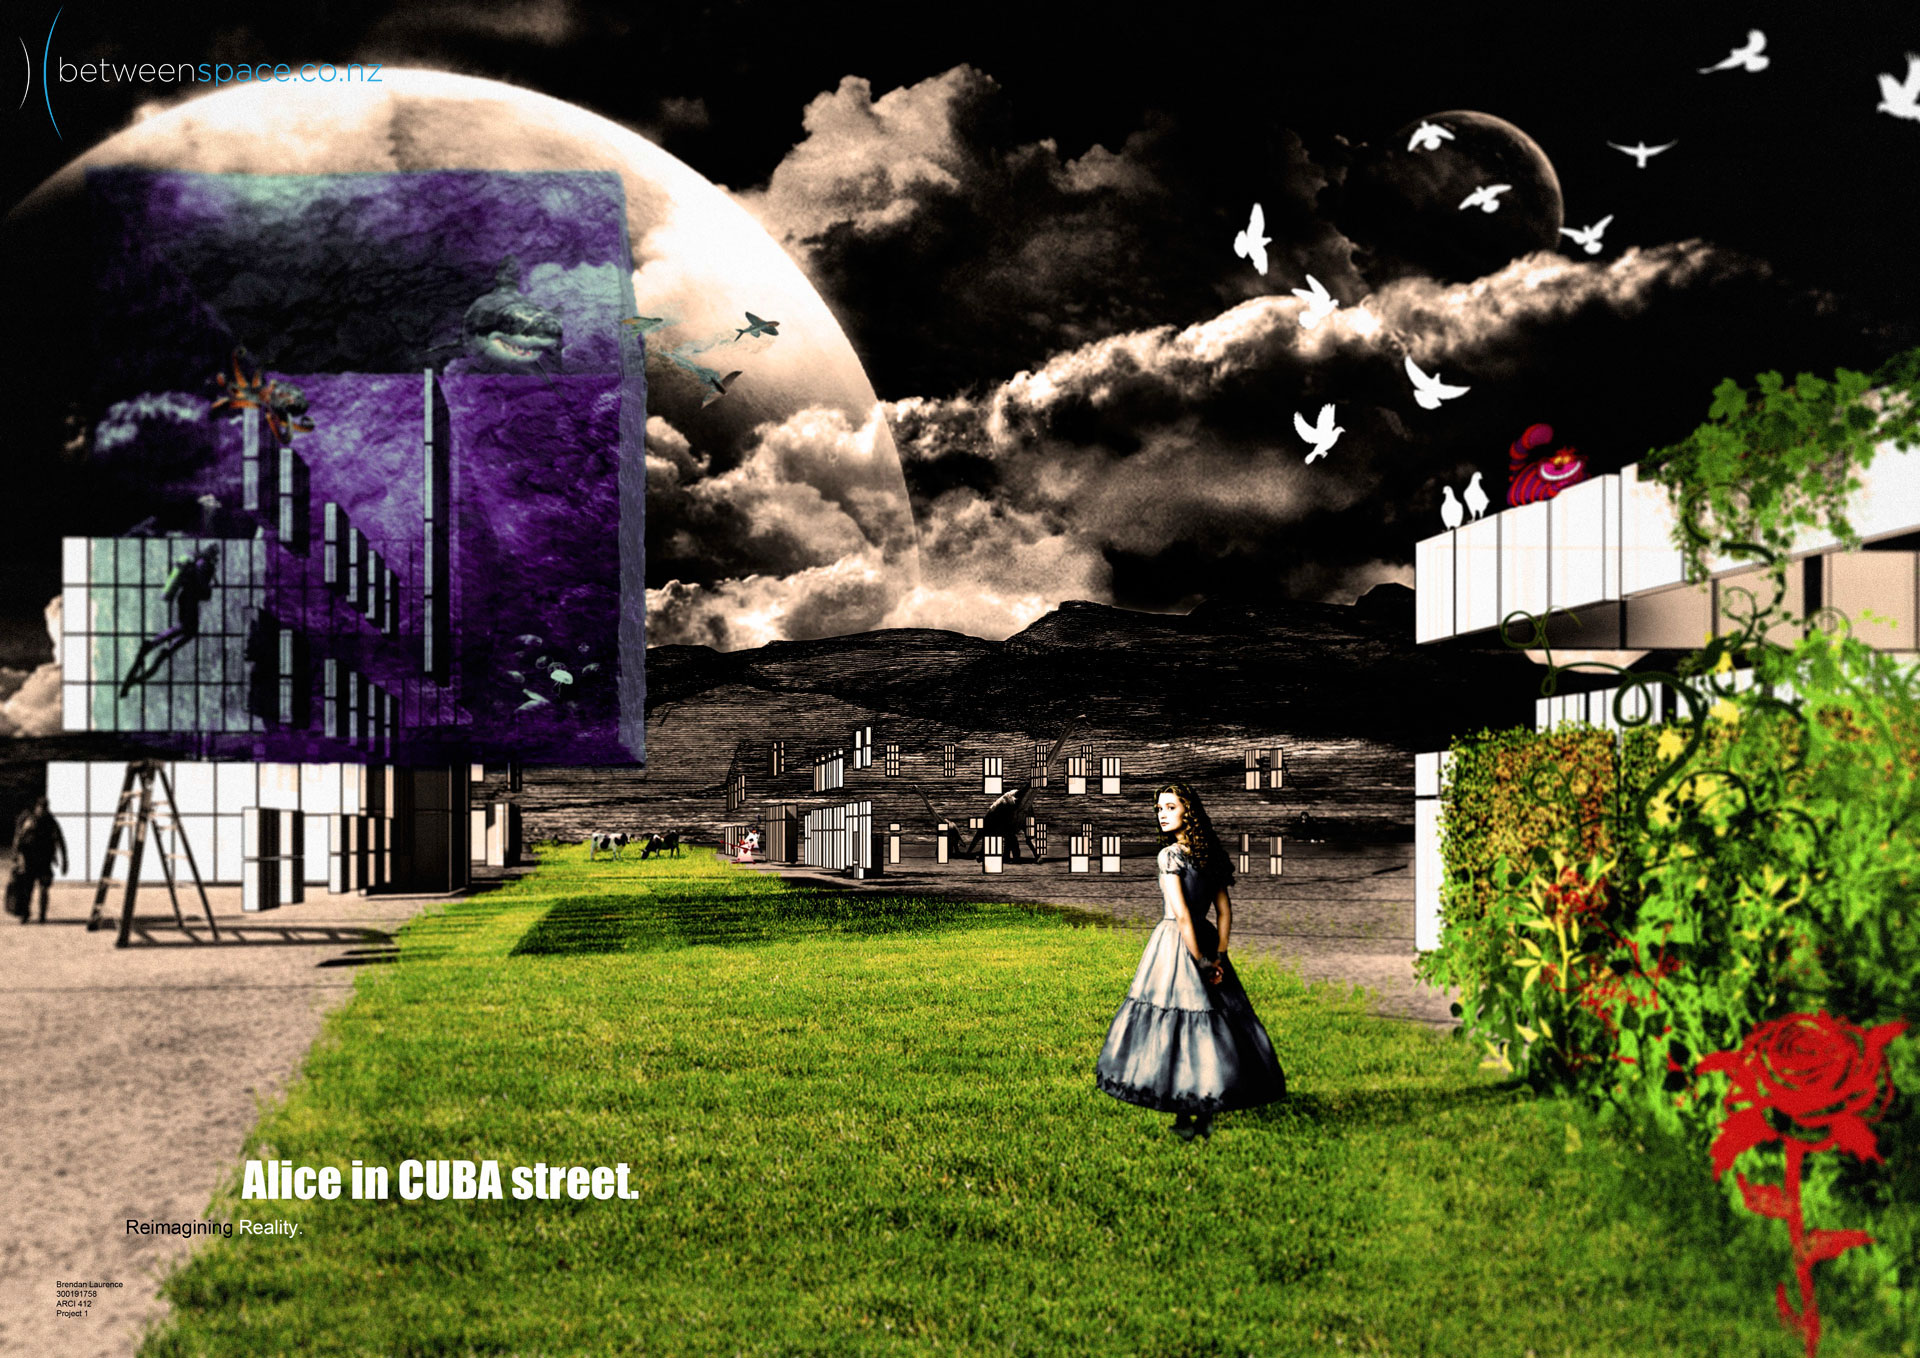 Brendan-Laurence---ARCI412---Project-1---Cuba-Street-Existing-(2012)-4